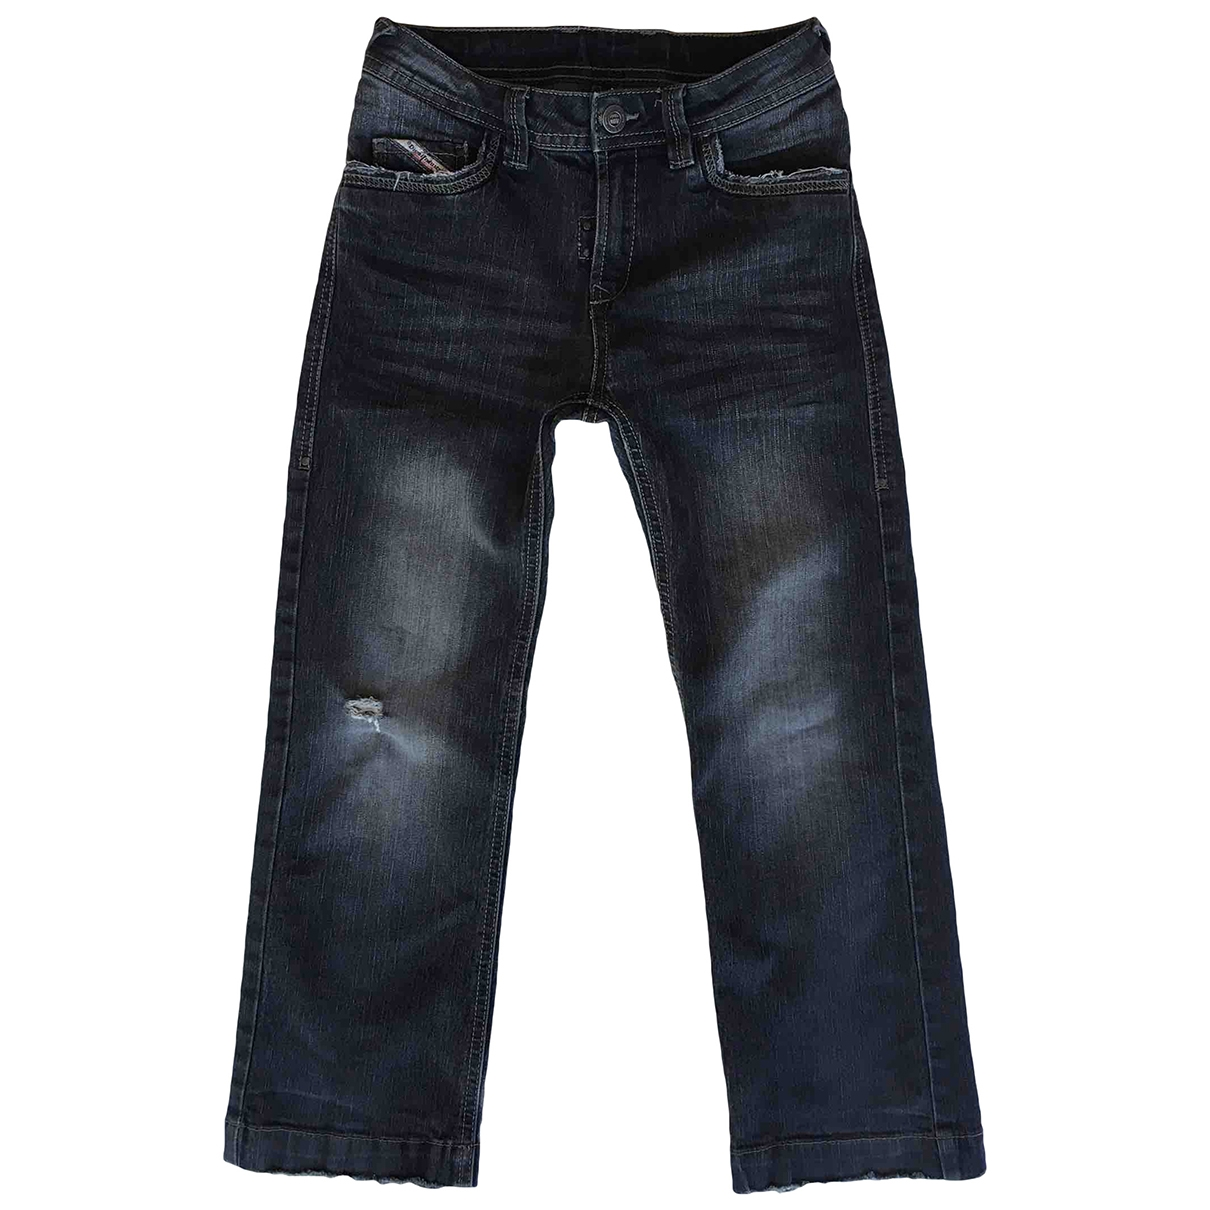 Diesel \N Grey Denim - Jeans Trousers for Kids 6 years - up to 114cm FR